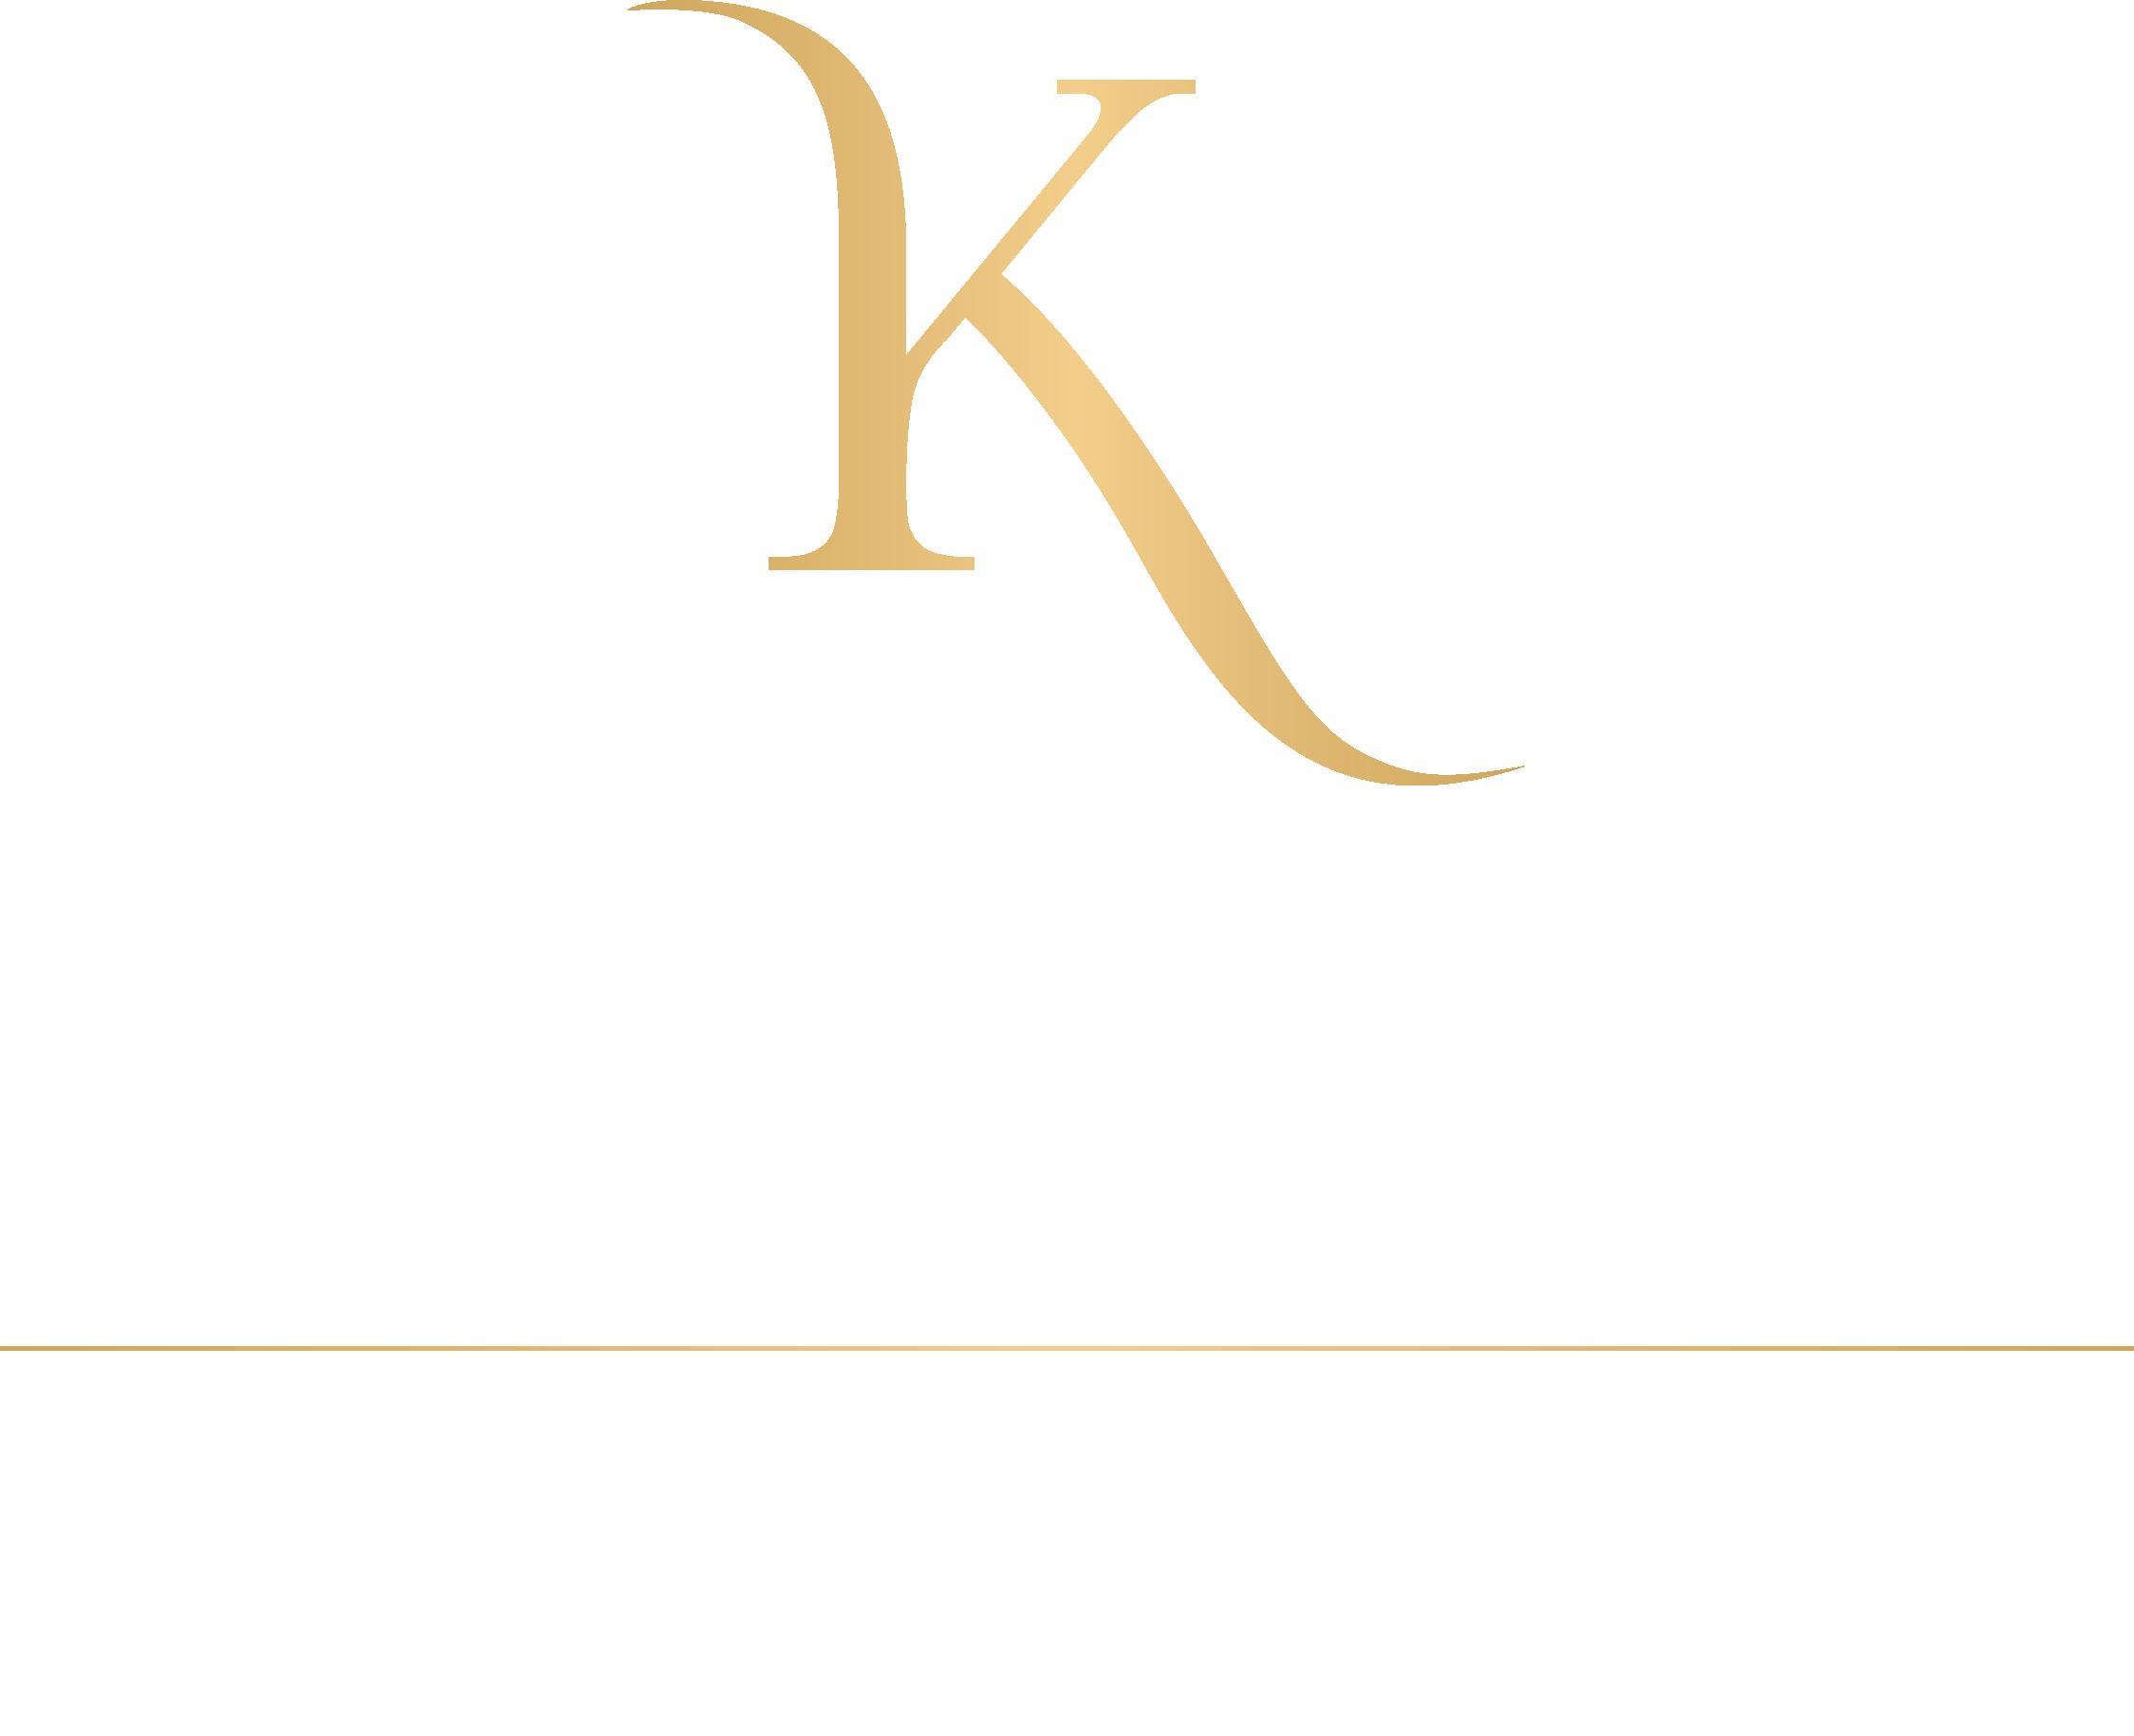 Kron_K_Live.png